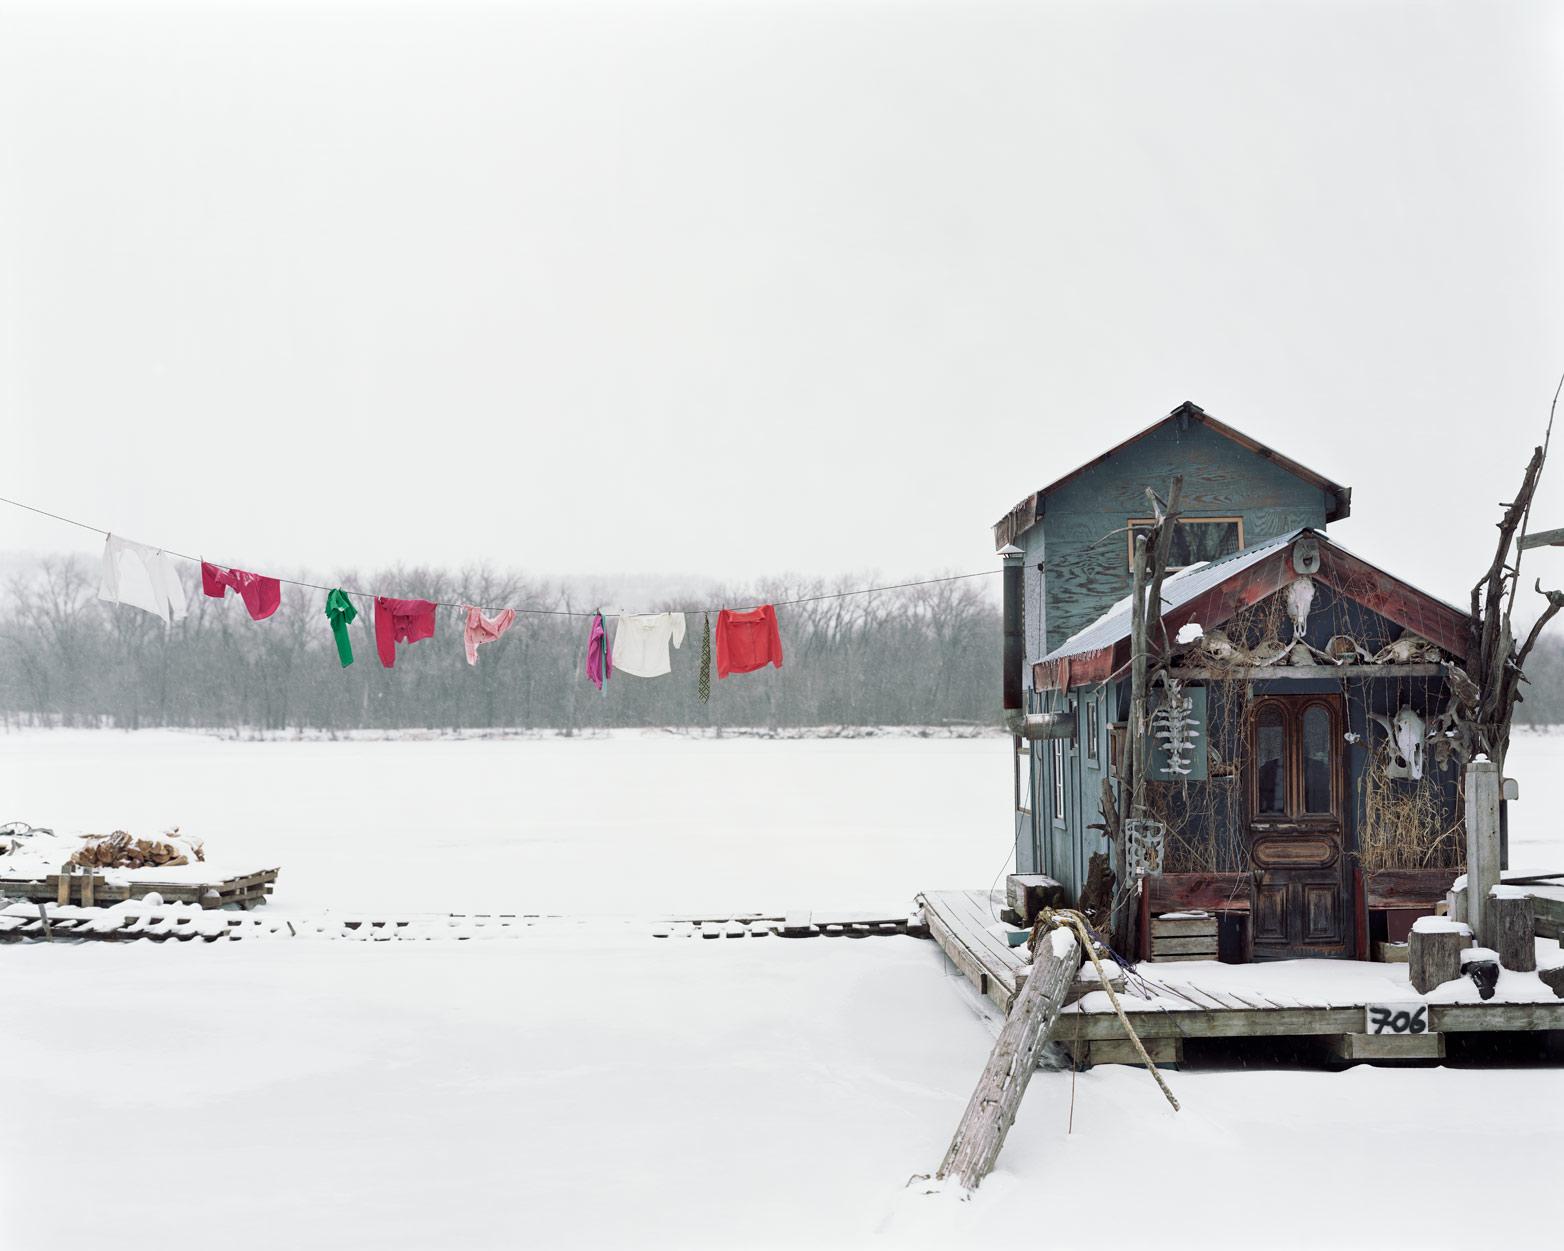 Peter's Houseboat, Winona, MN, 2002